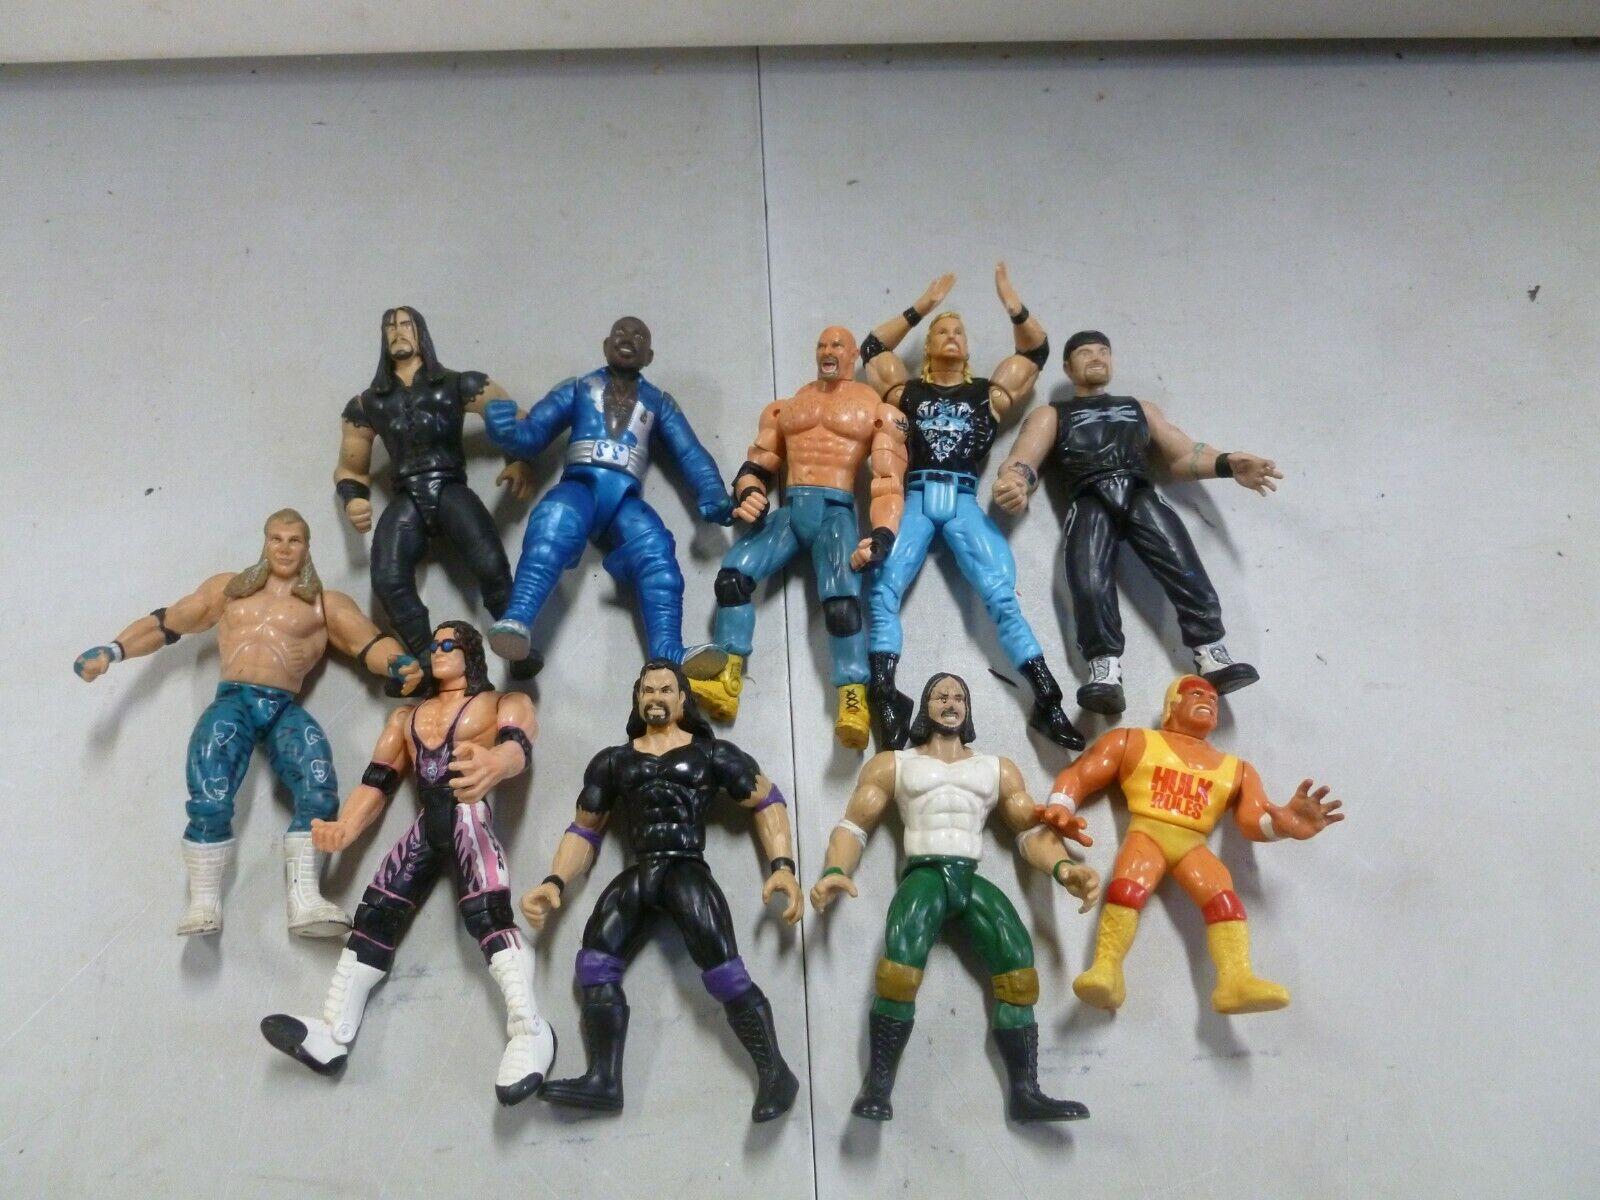 Lot of 10 Assorted Action Wrestling Figures goldberg, Hulk